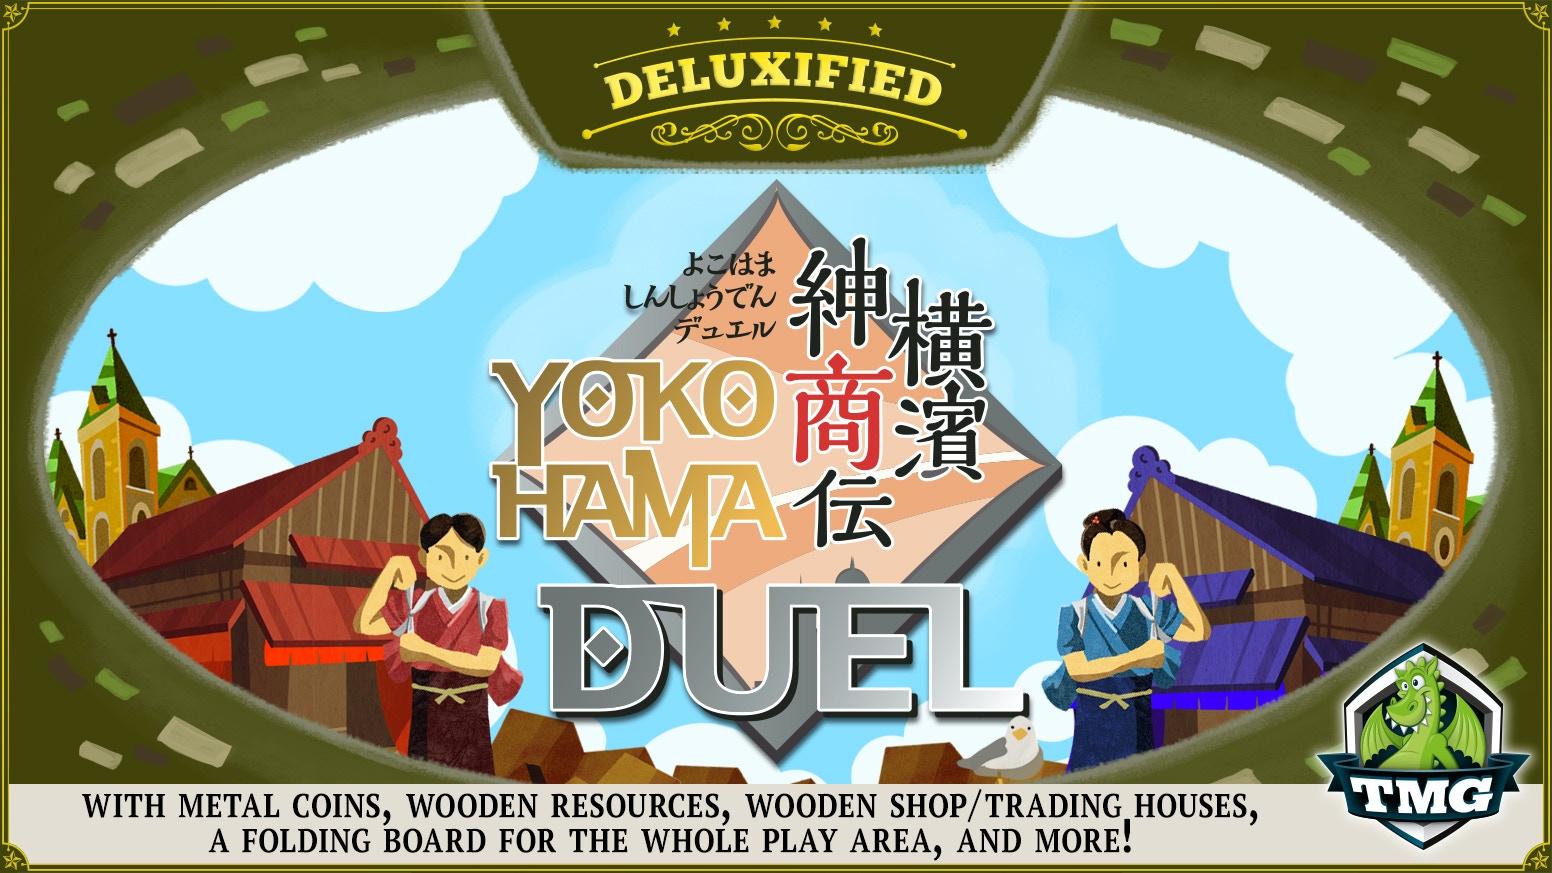 Tasty Minstrel Games presents Hisashi Hayashi's Yokohama Duel - presented in glorious Deluxified™ fashion!